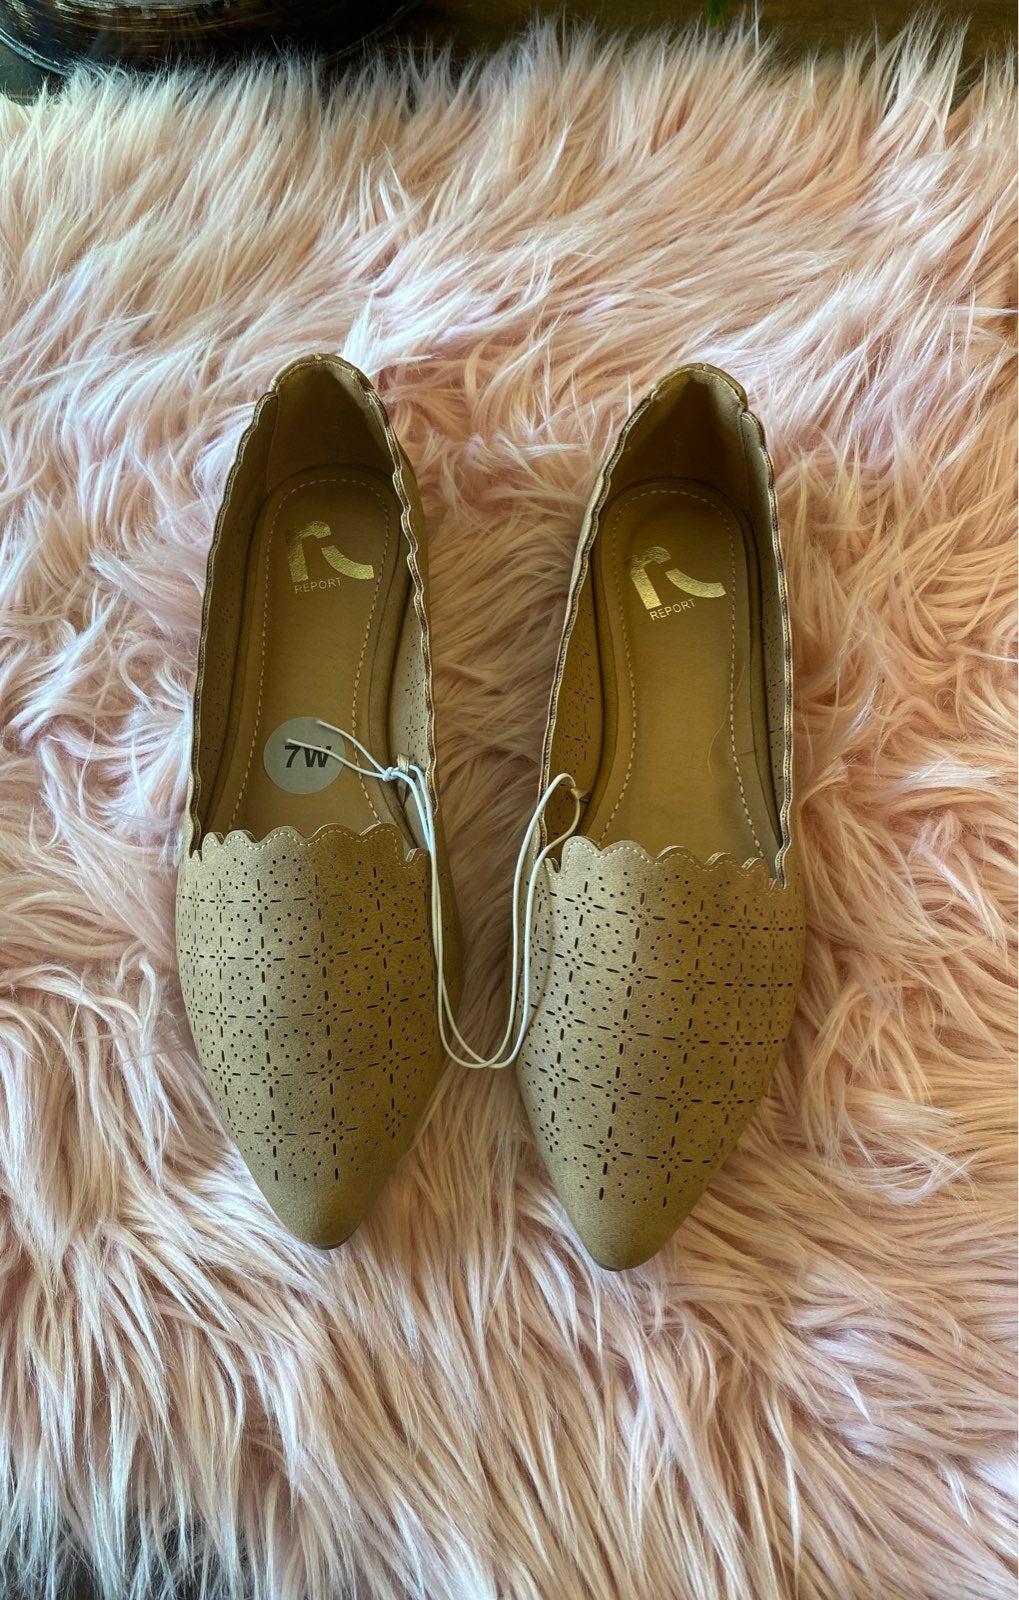 Report Tan khaki Flats shoes 7W